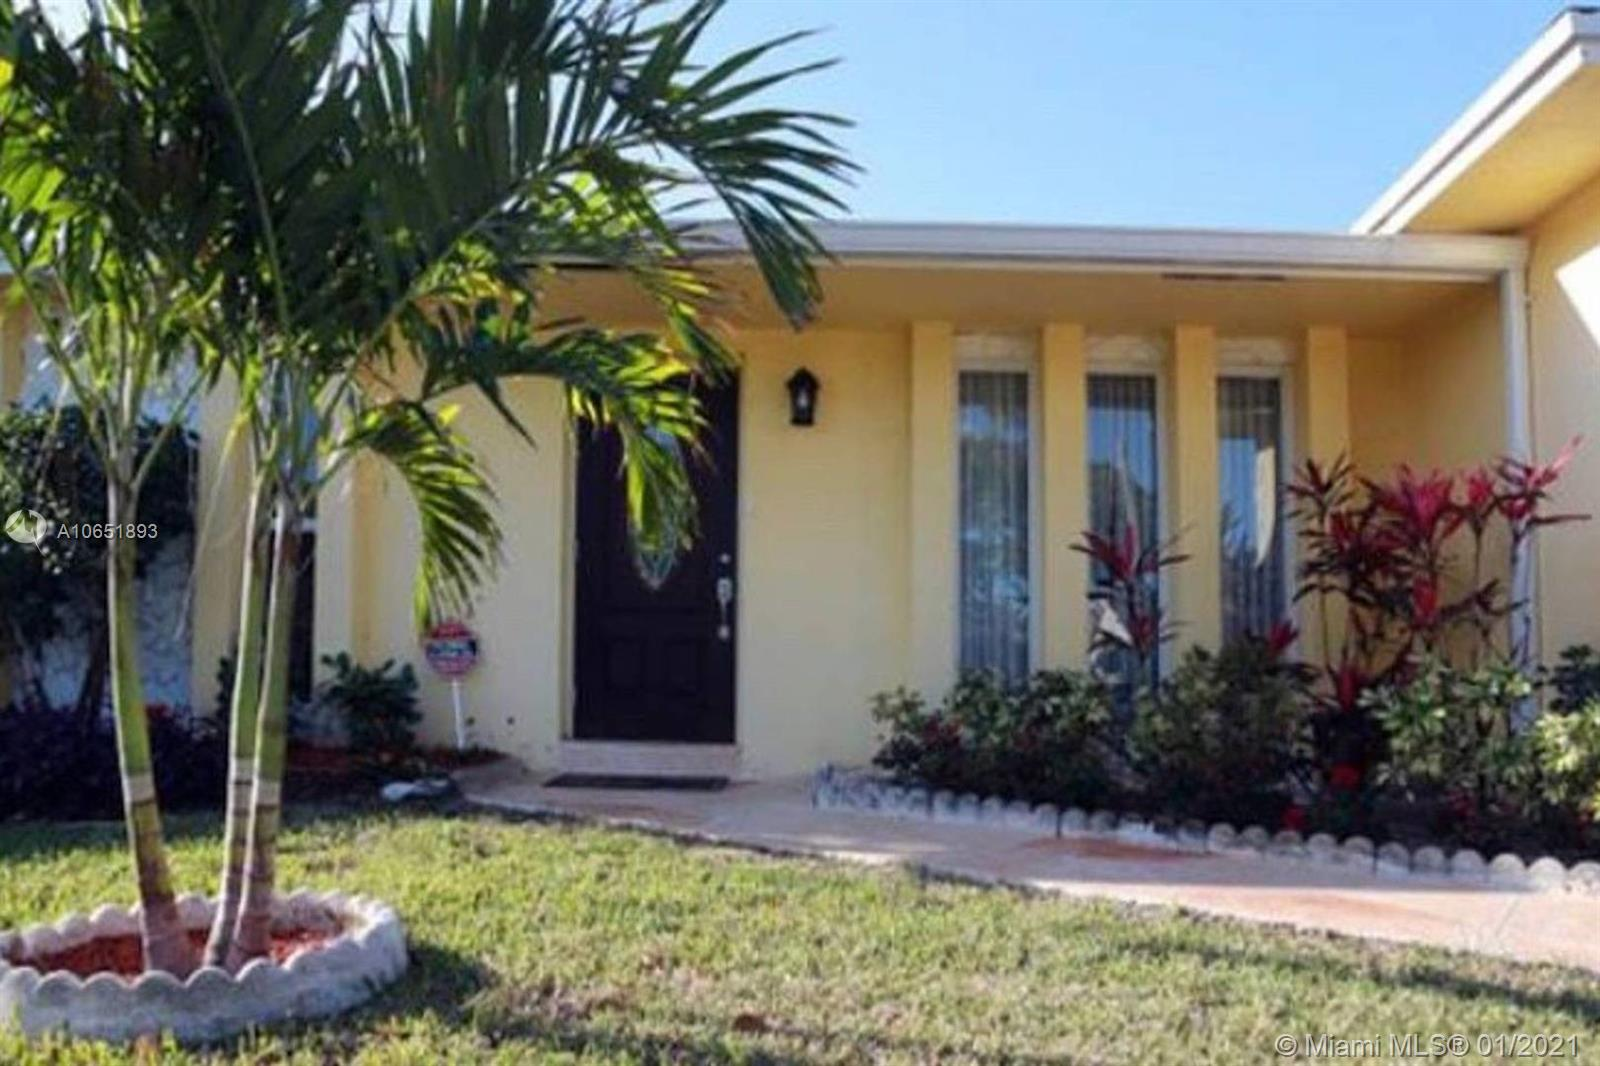 314 SE 4th St, Dania Beach, FL 33004